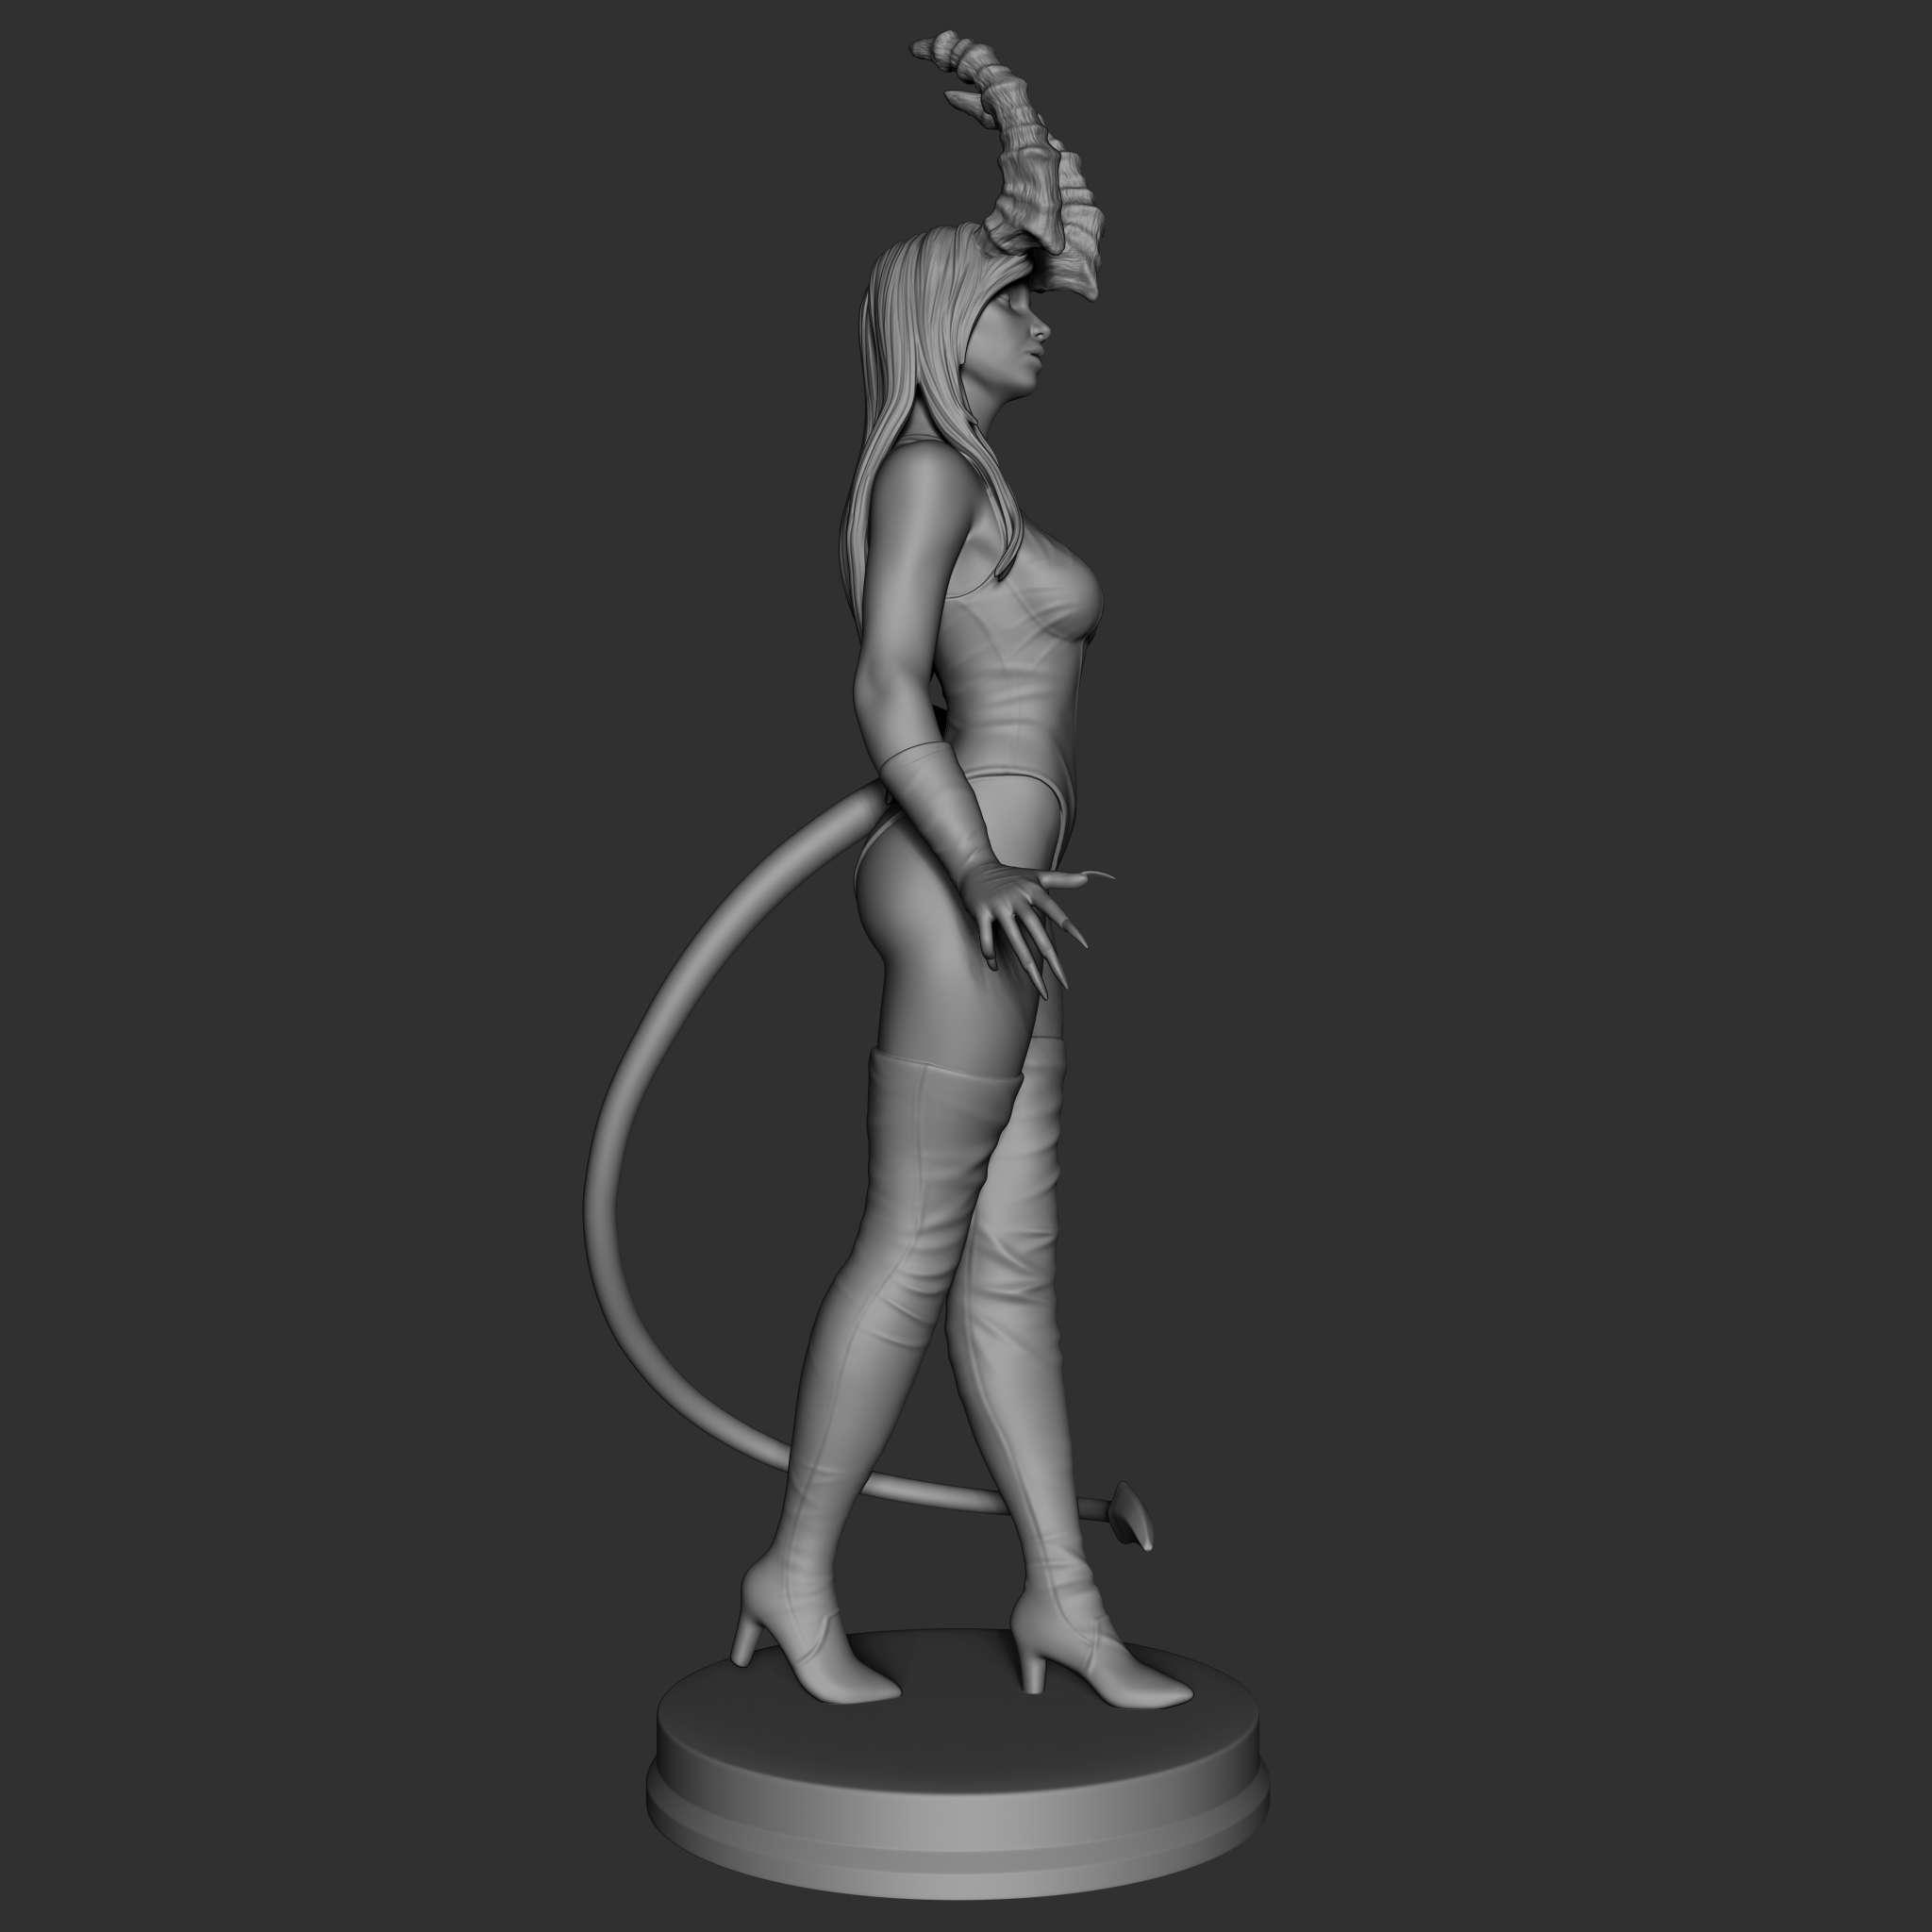 Demon Lady - This is Demon lady. she is very excited for you to take her home to decorate your shelves in an elegant and sexy way and make you company. I also made the .ztl file available. feel free to ask me for changes or a new model if my job pleases you, i'm available.  Height= 25cm - Los mejores archivos para impresión 3D del mundo. Modelos Stl divididos en partes para facilitar la impresión 3D. Todo tipo de personajes, decoración, cosplay, prótesis, piezas. Calidad en impresión 3D. Modelos 3D asequibles. Bajo costo. Compras colectivas de archivos 3D.